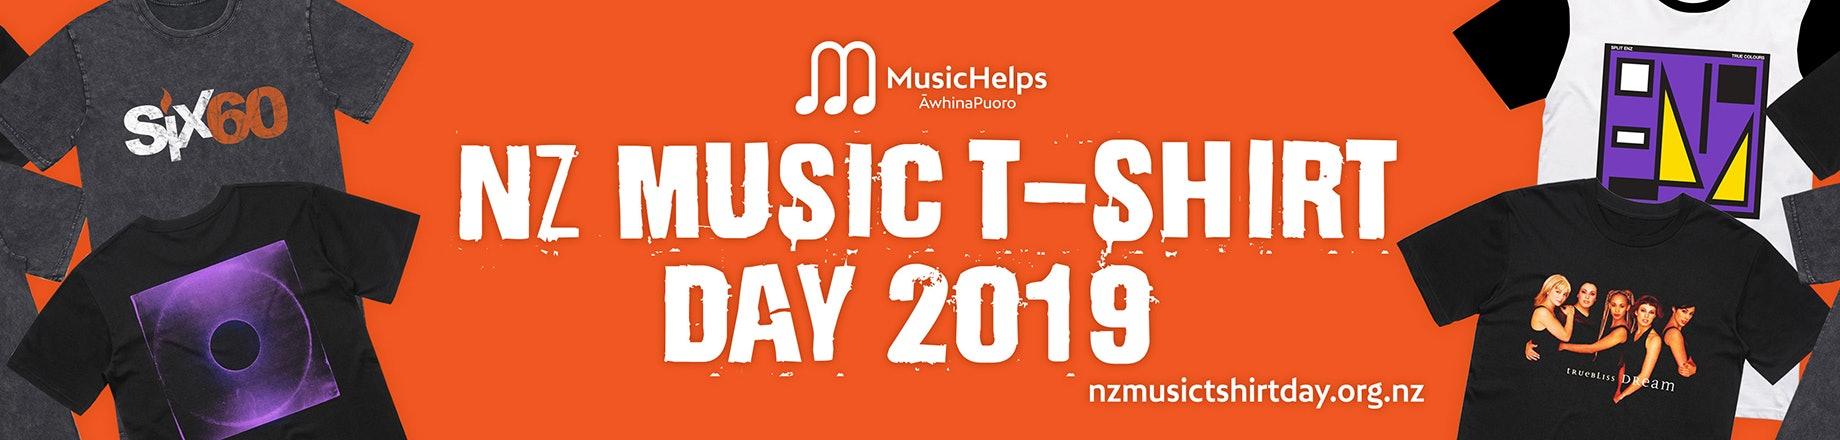 NZ Music T-Shirt Day for MusicHelps